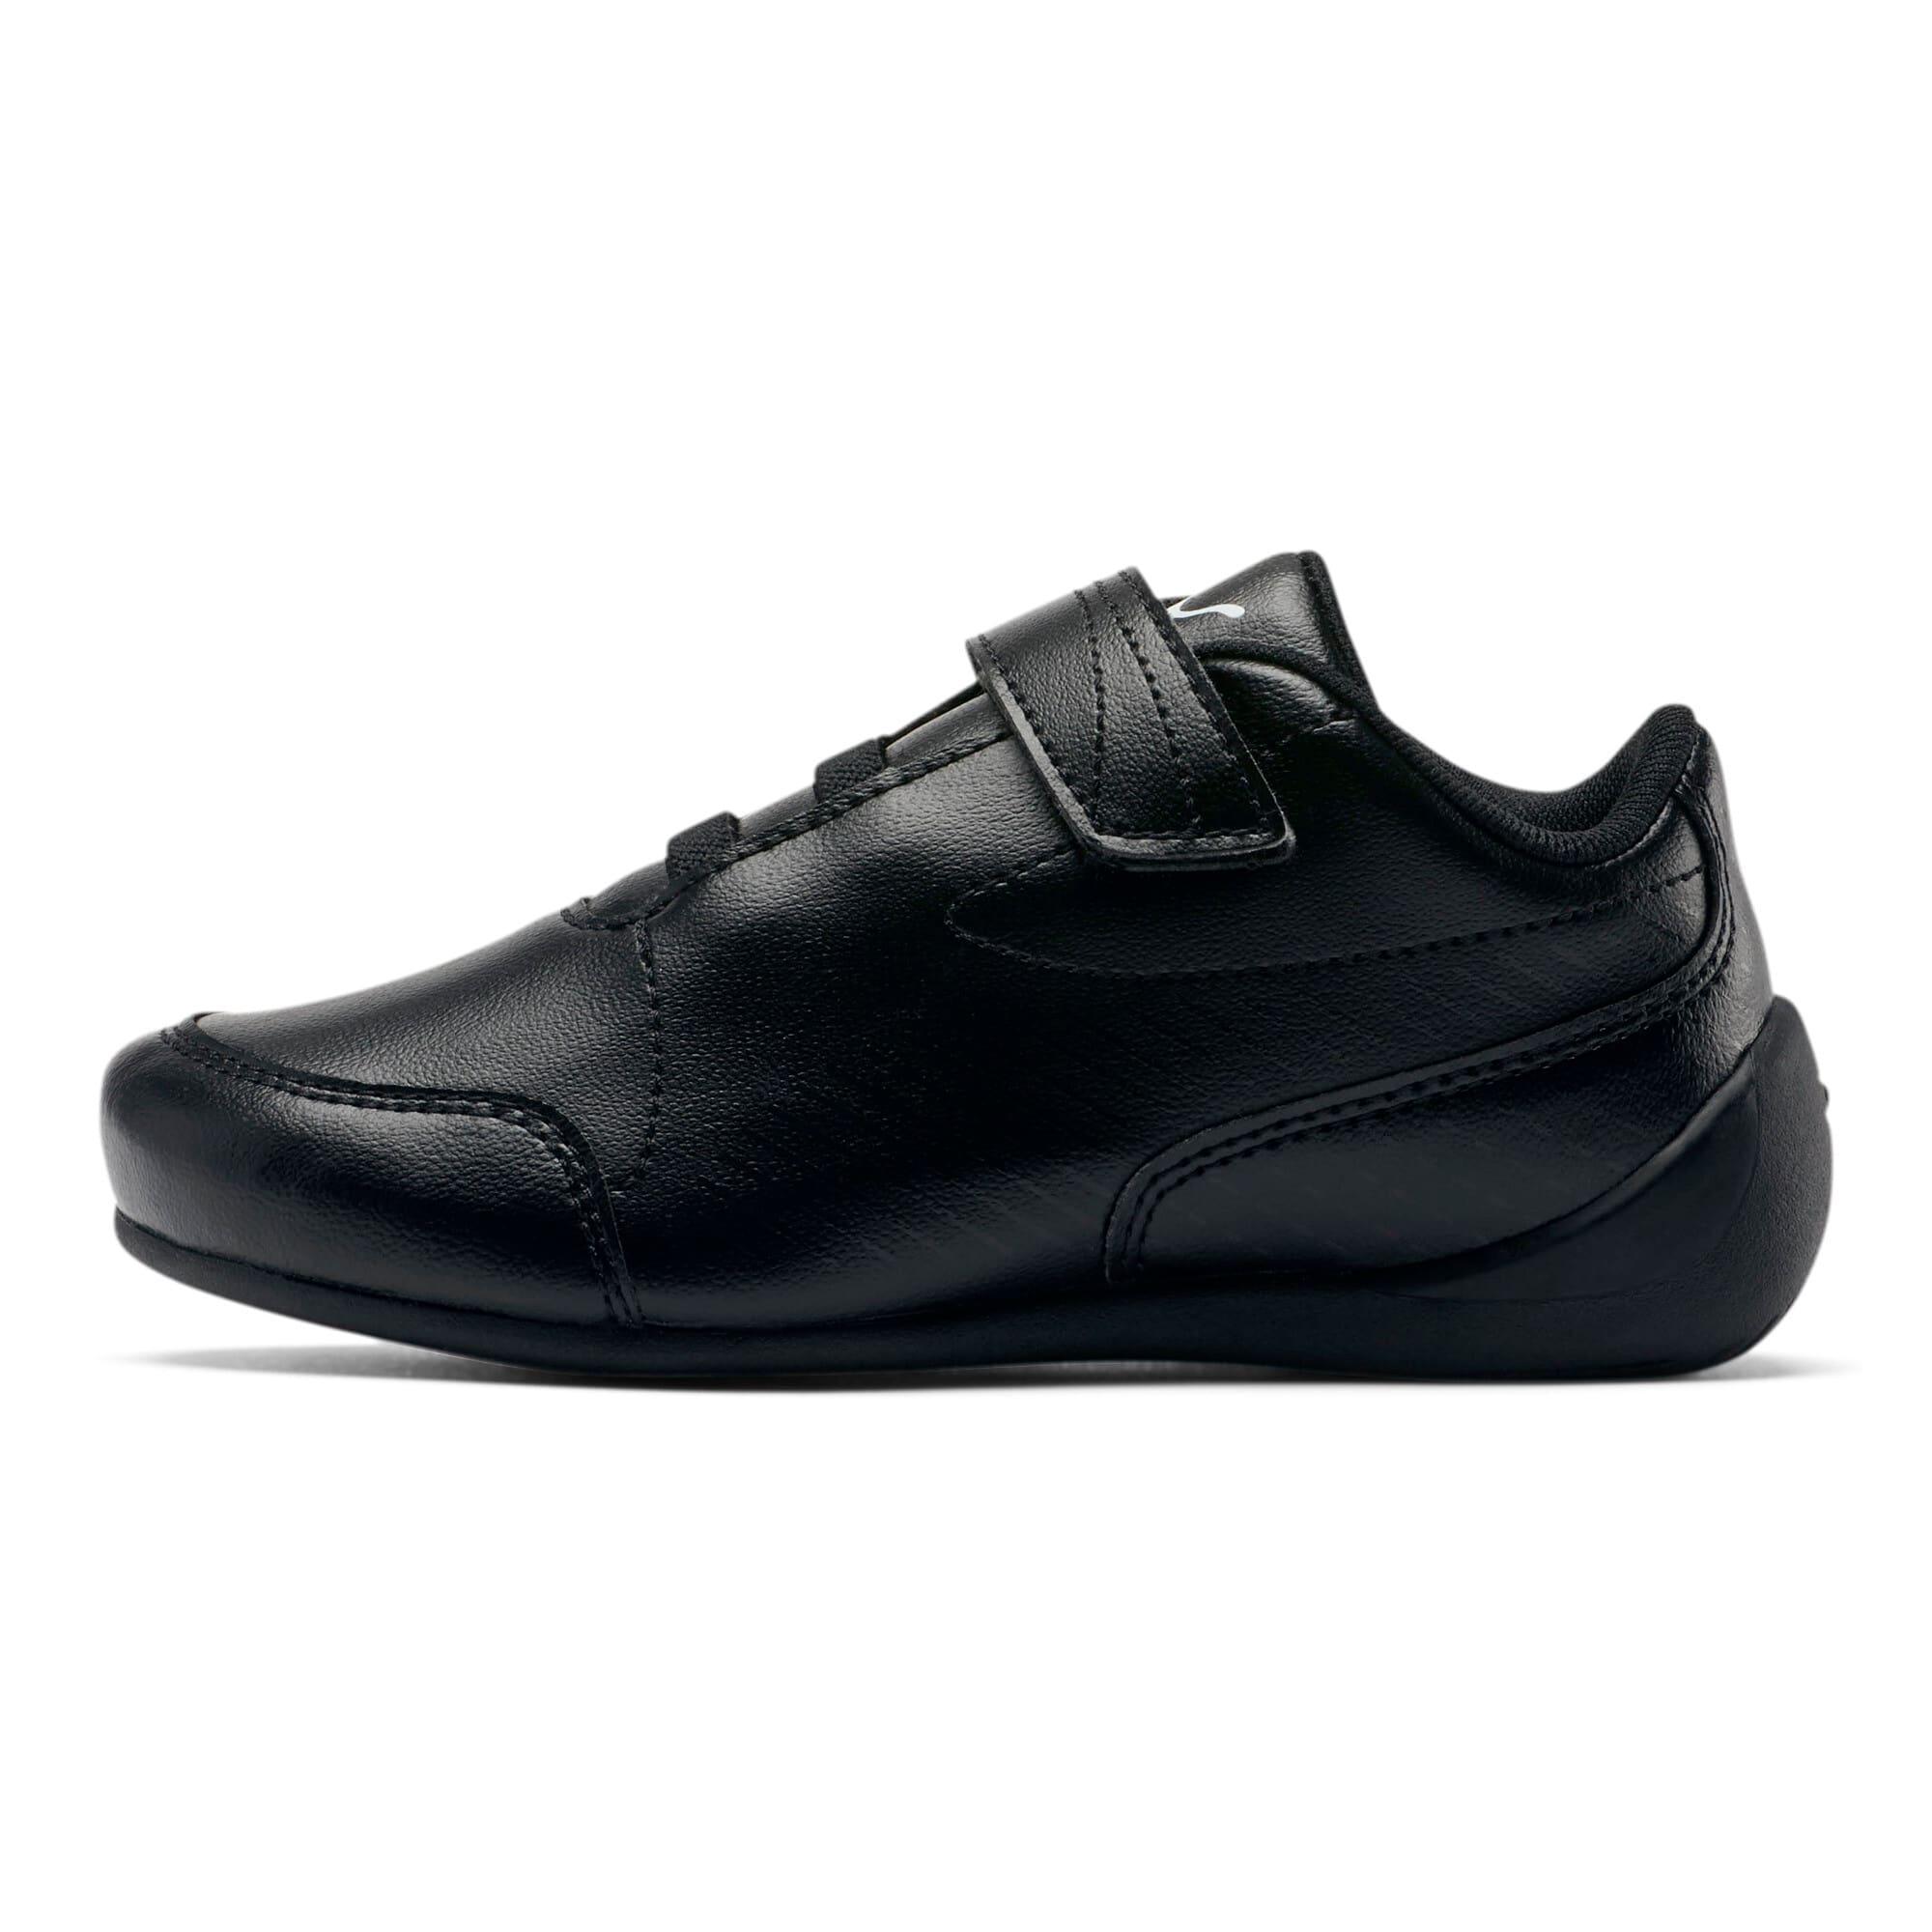 Thumbnail 1 of Drift Cat 7S Ultra Little Kids' Shoes, Puma Black-Puma Black, medium